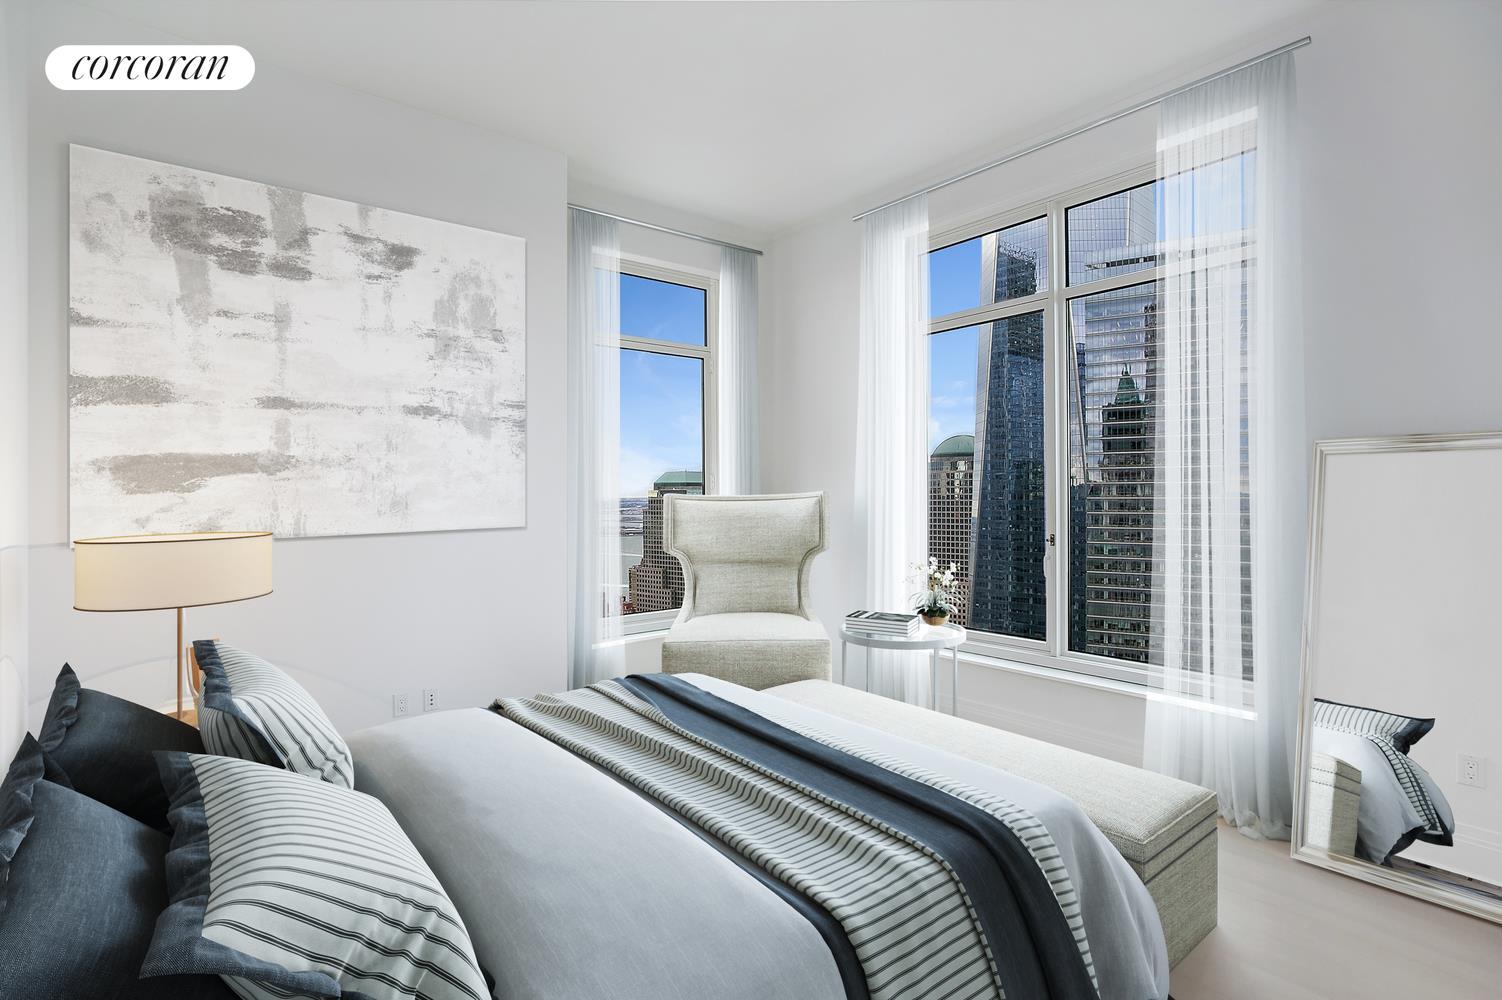 Corcoran, 30 PARK PLACE, Apt. 54D, Tribeca Rentals, Manhattan ...